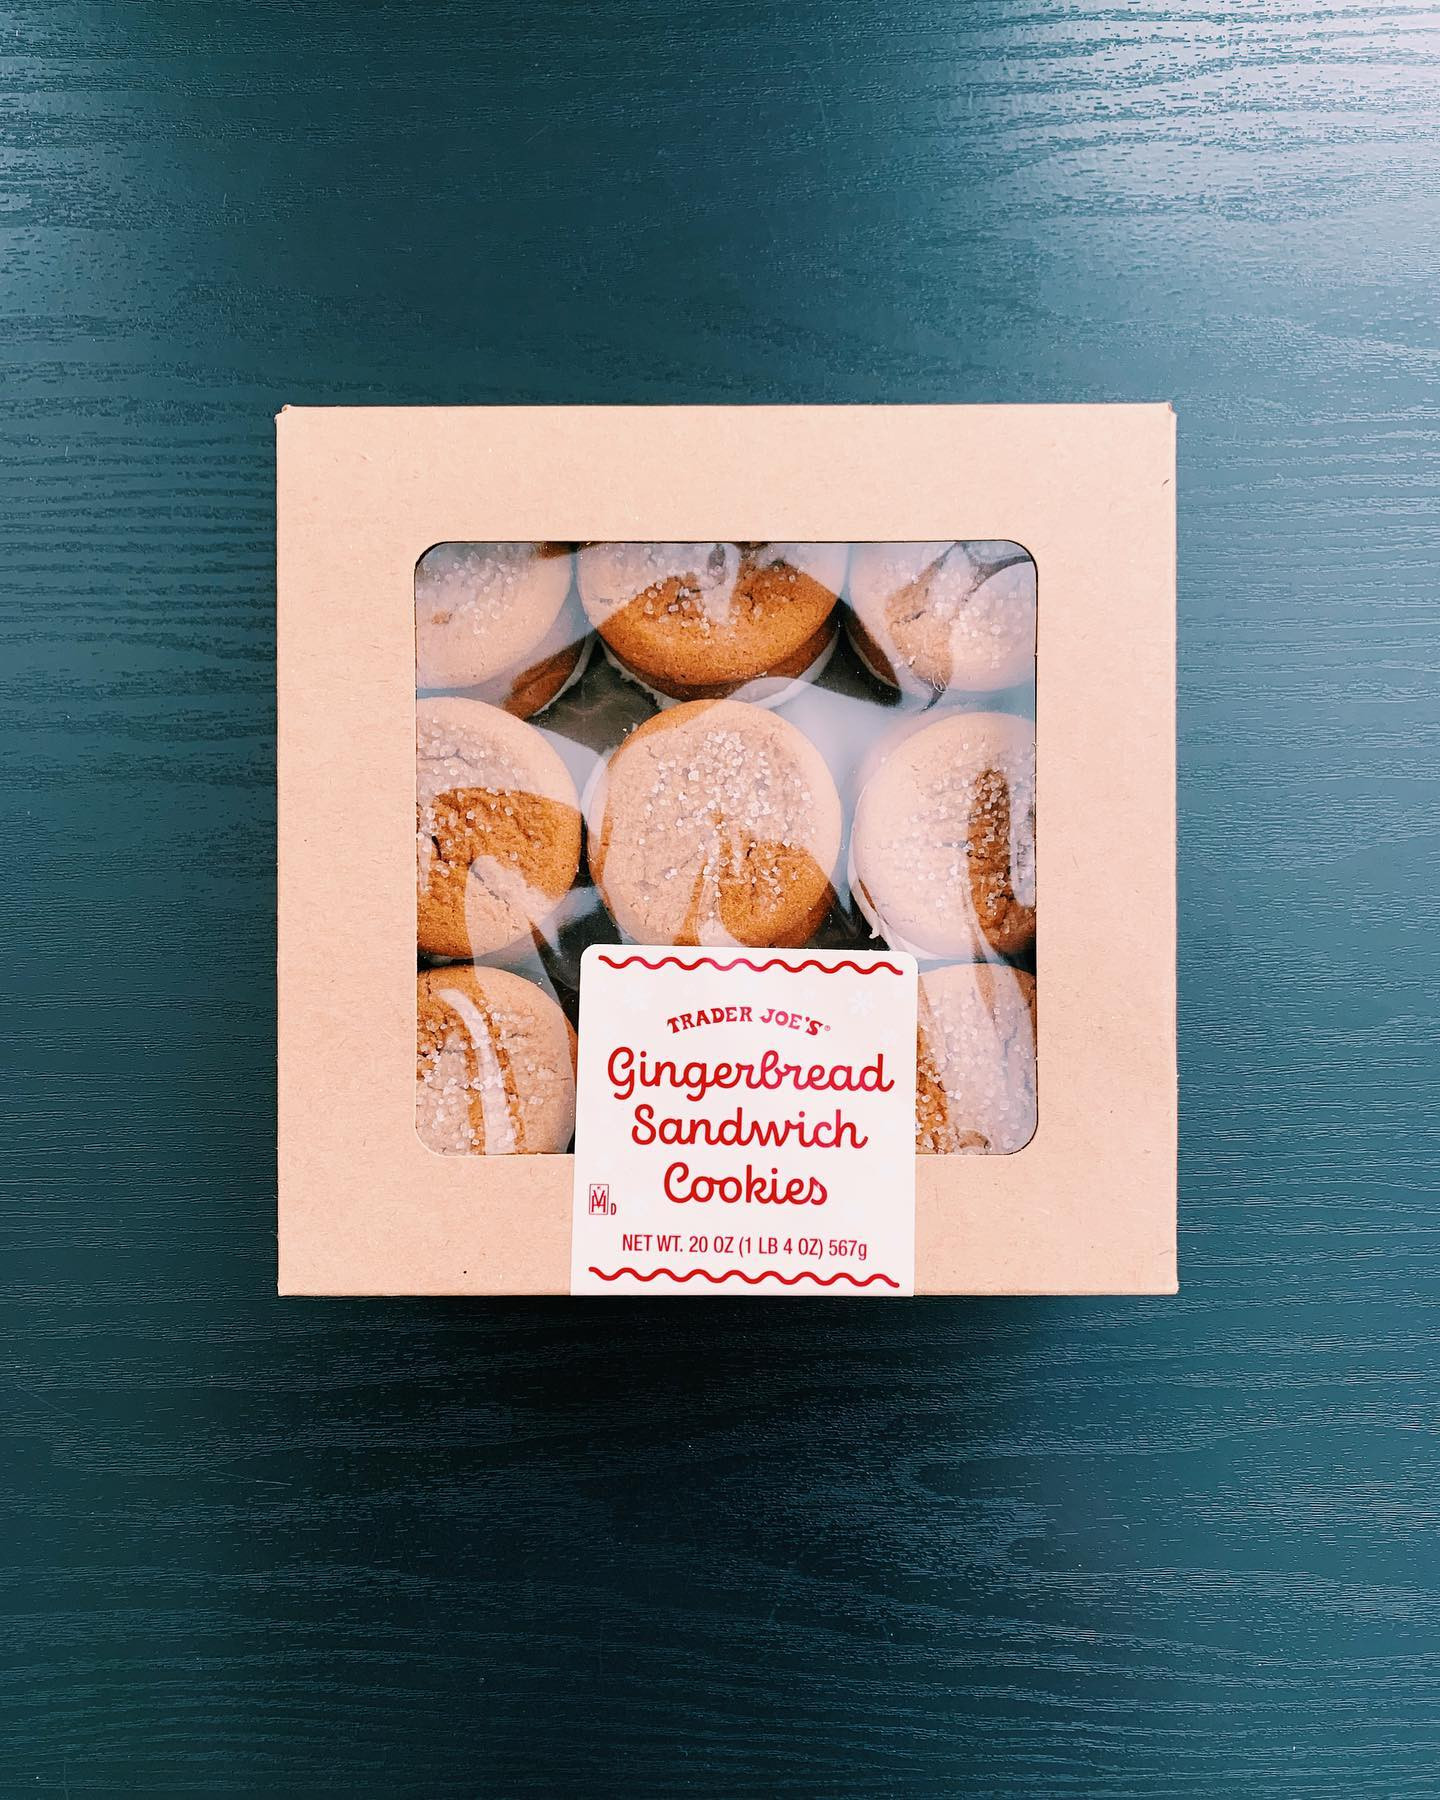 Gingerbread Sandwich Cookies: 9/10